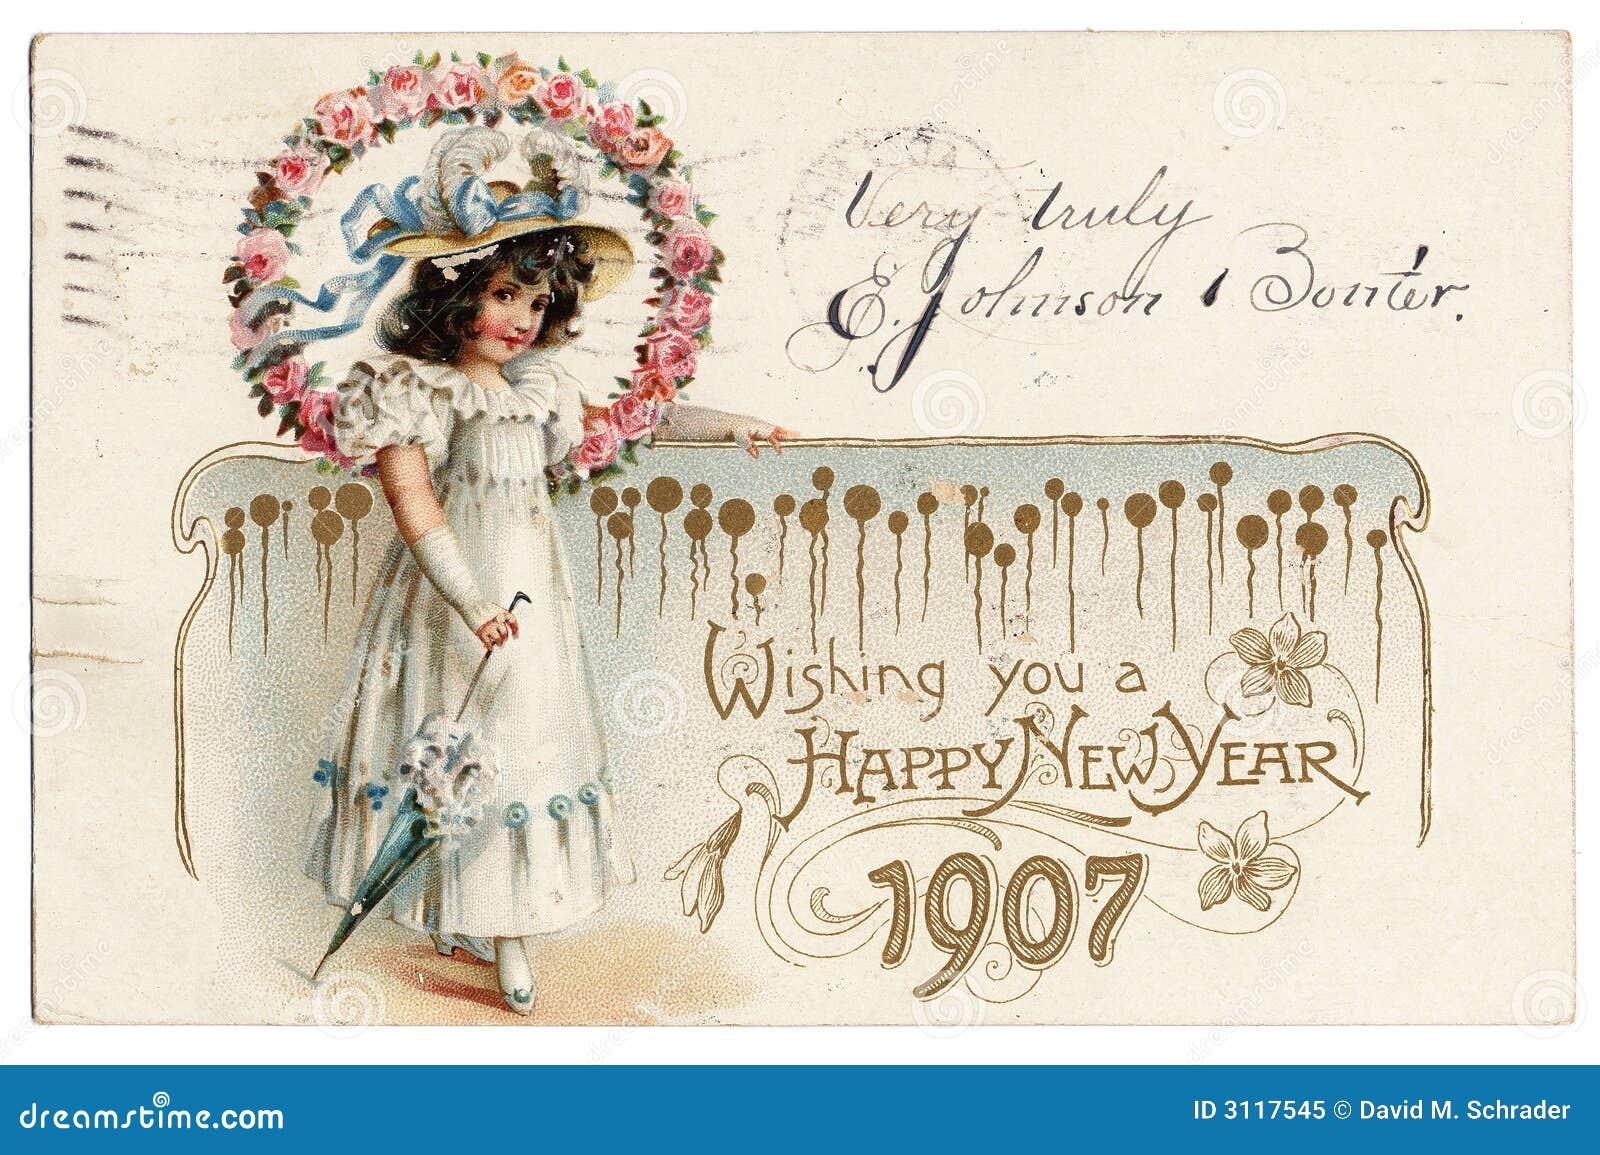 1907-postcard-3117545.jpg